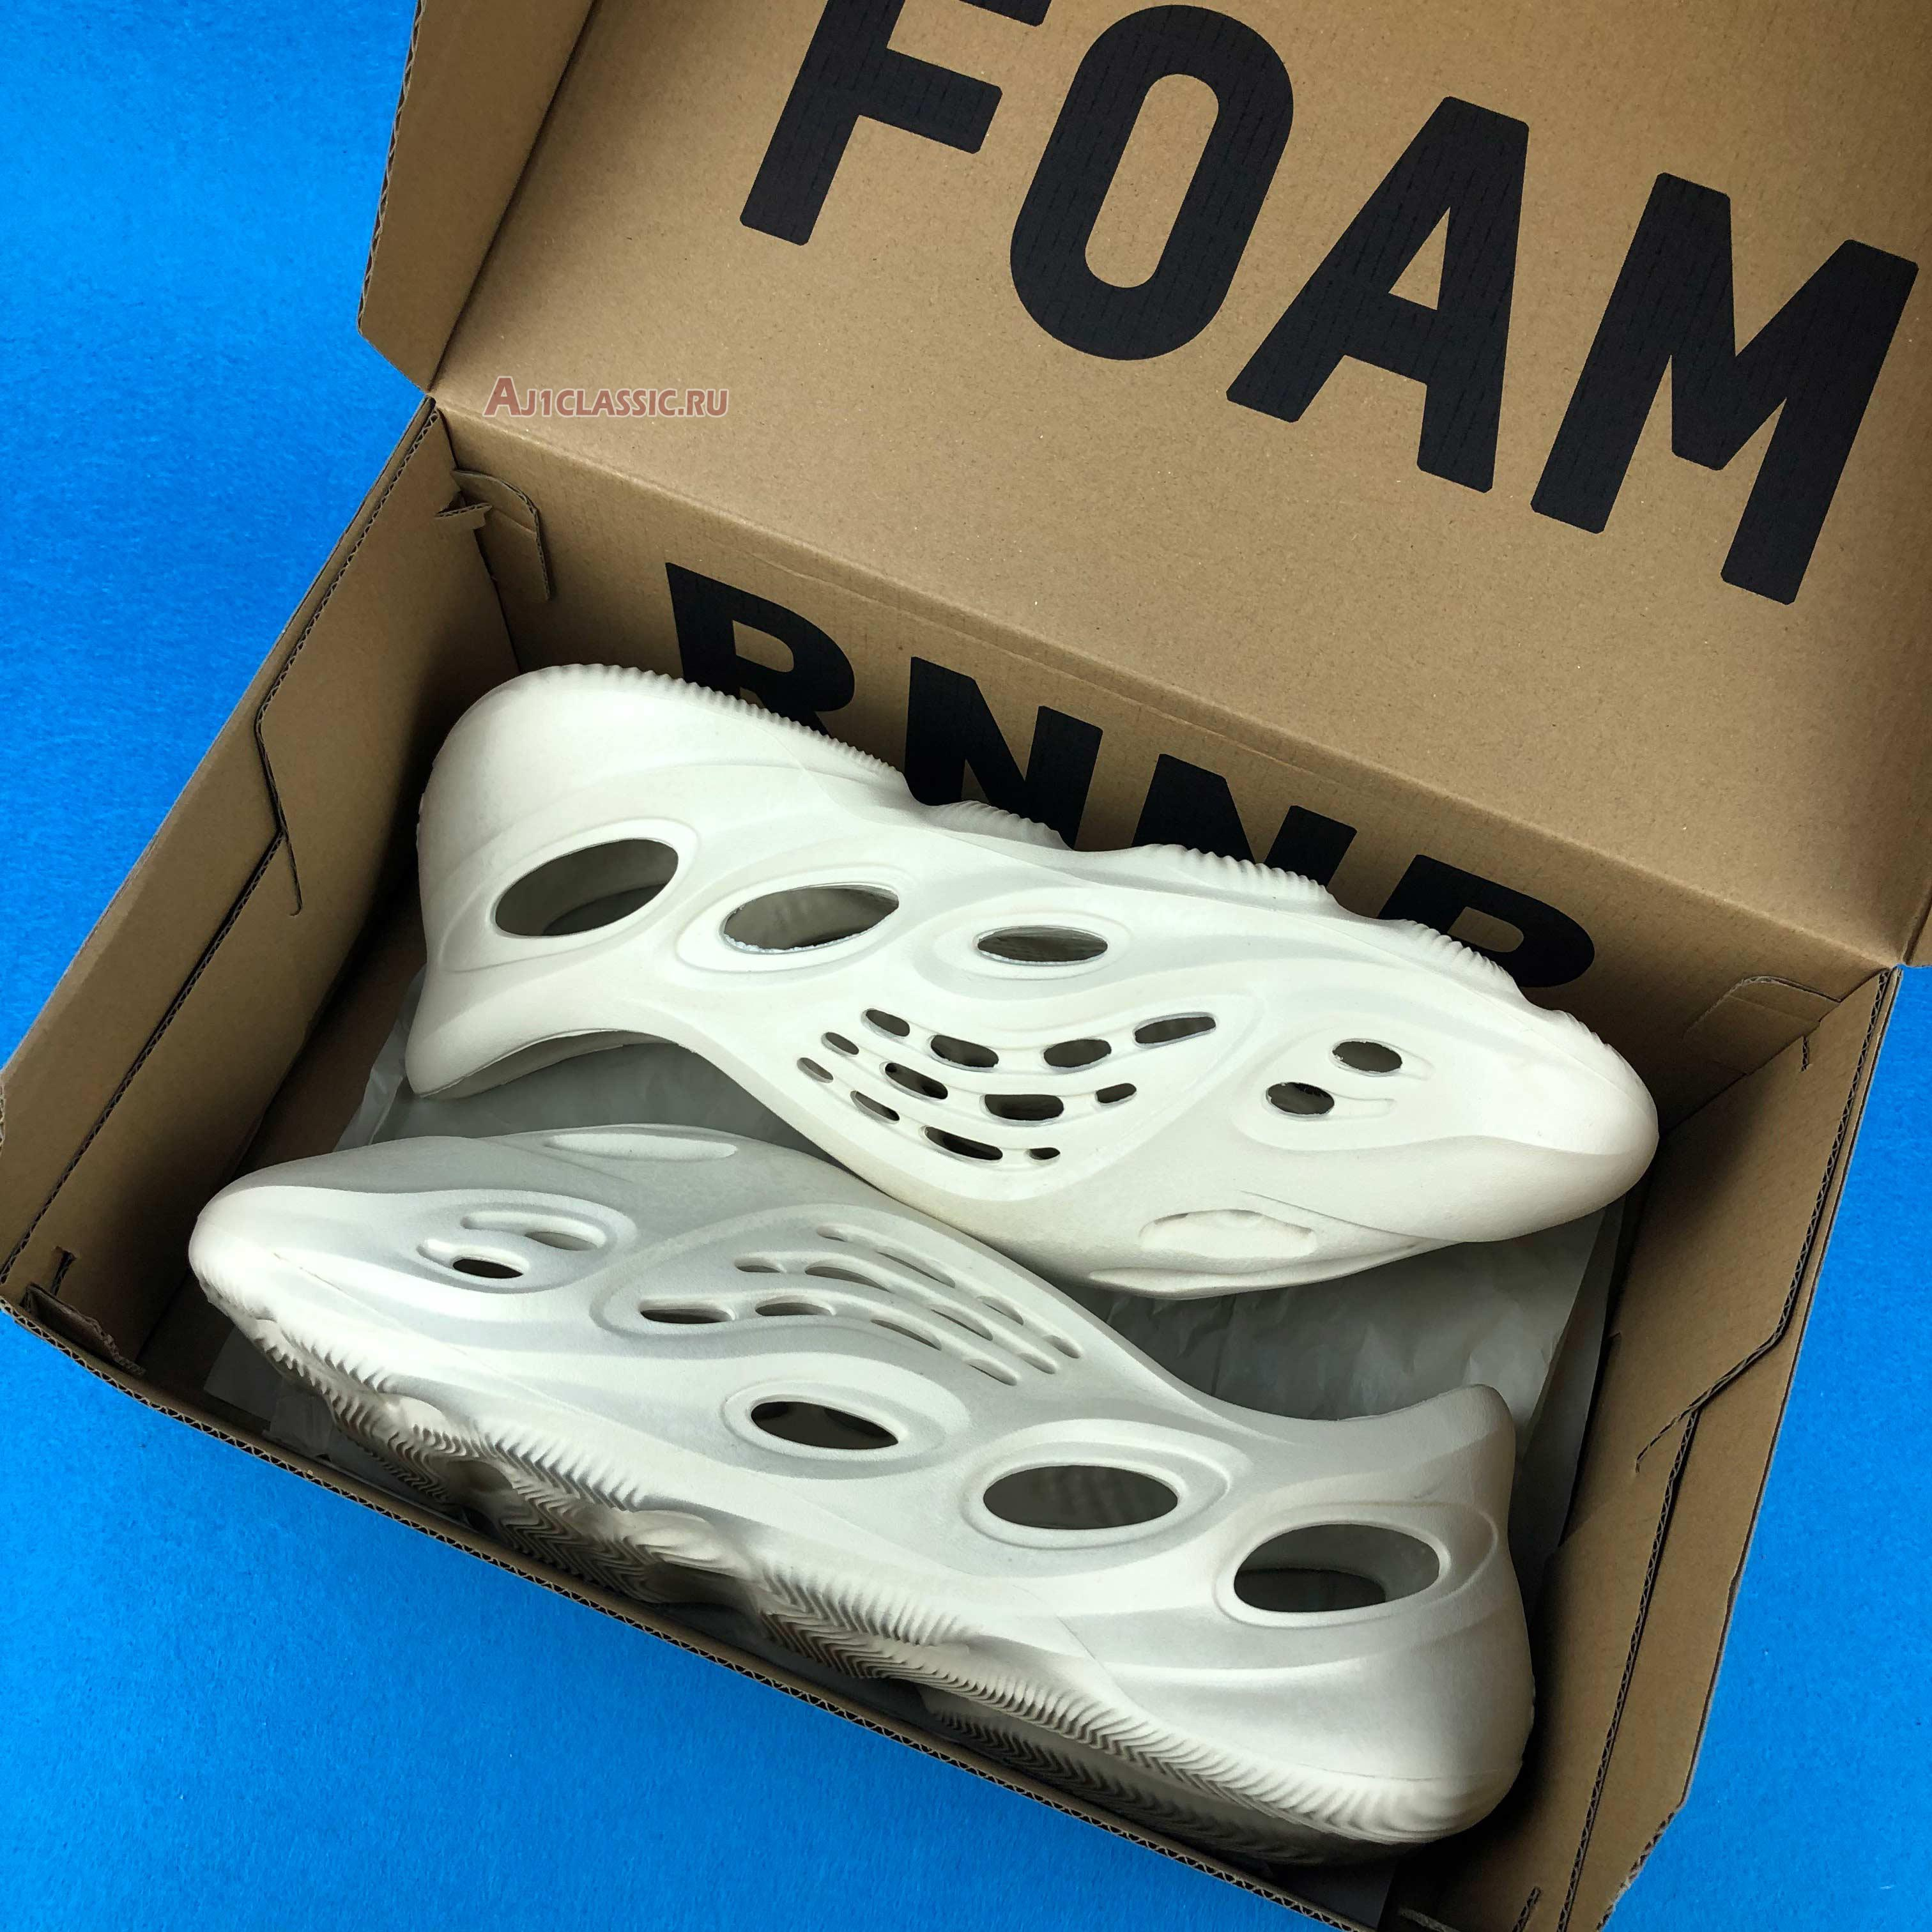 "Adidas Yeezy Foam Runner ""Sand"" FY4567"